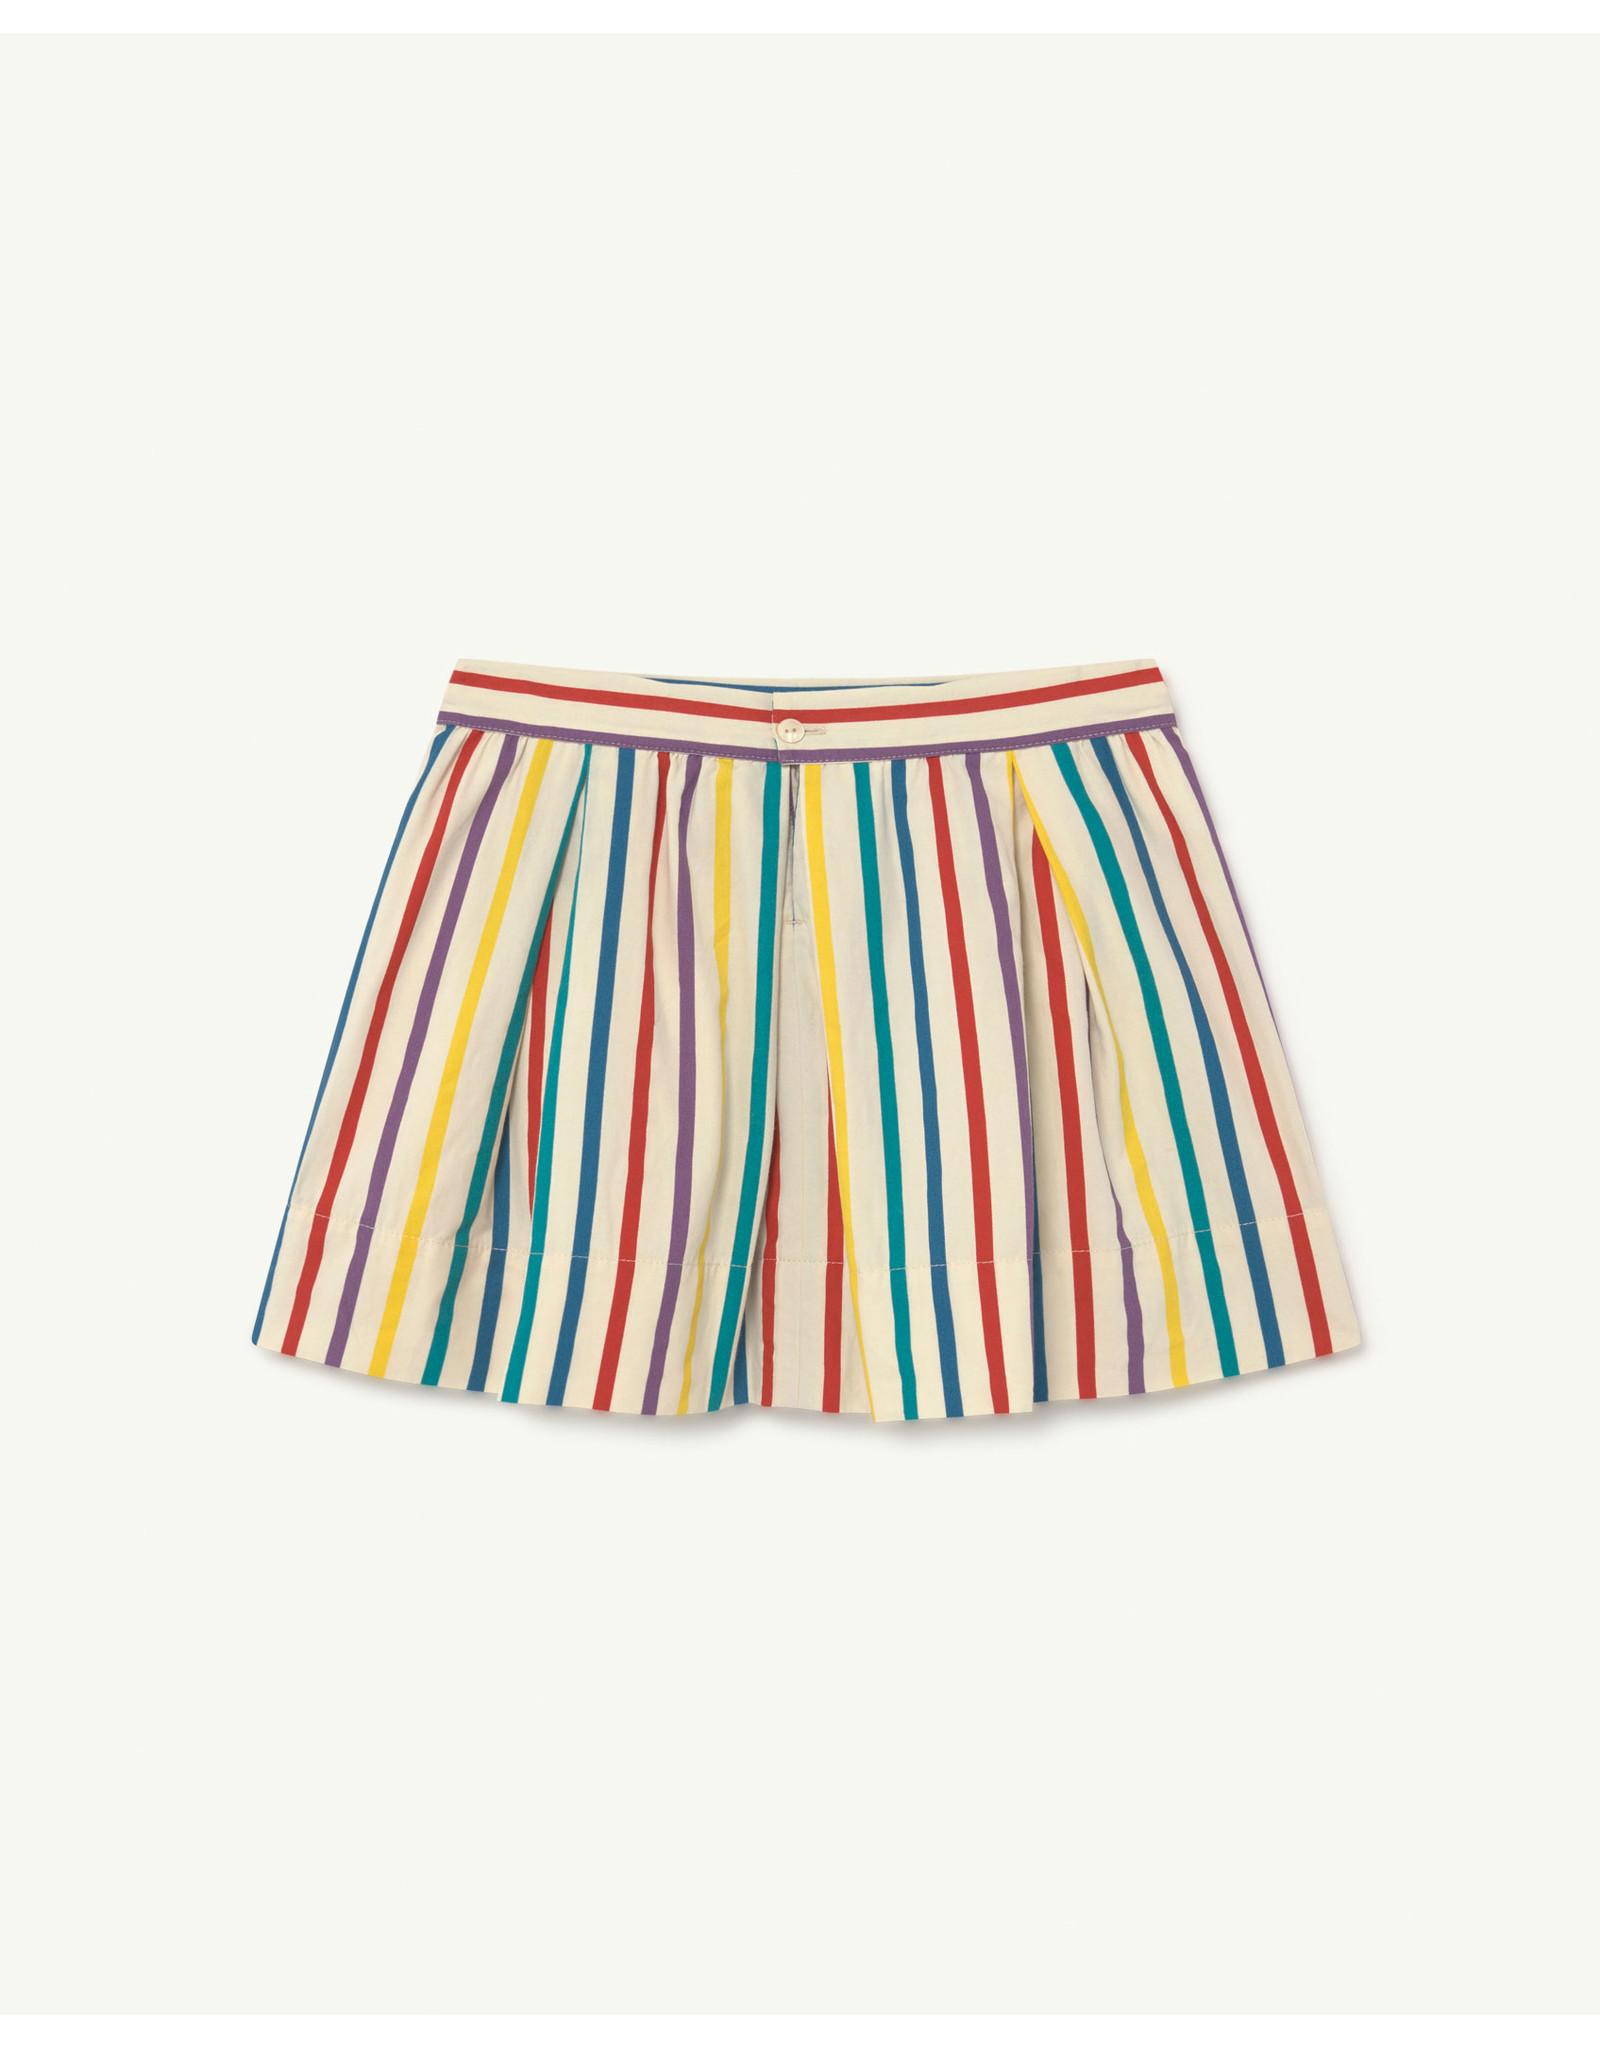 TAO PF21 137 Bird Kids skirt